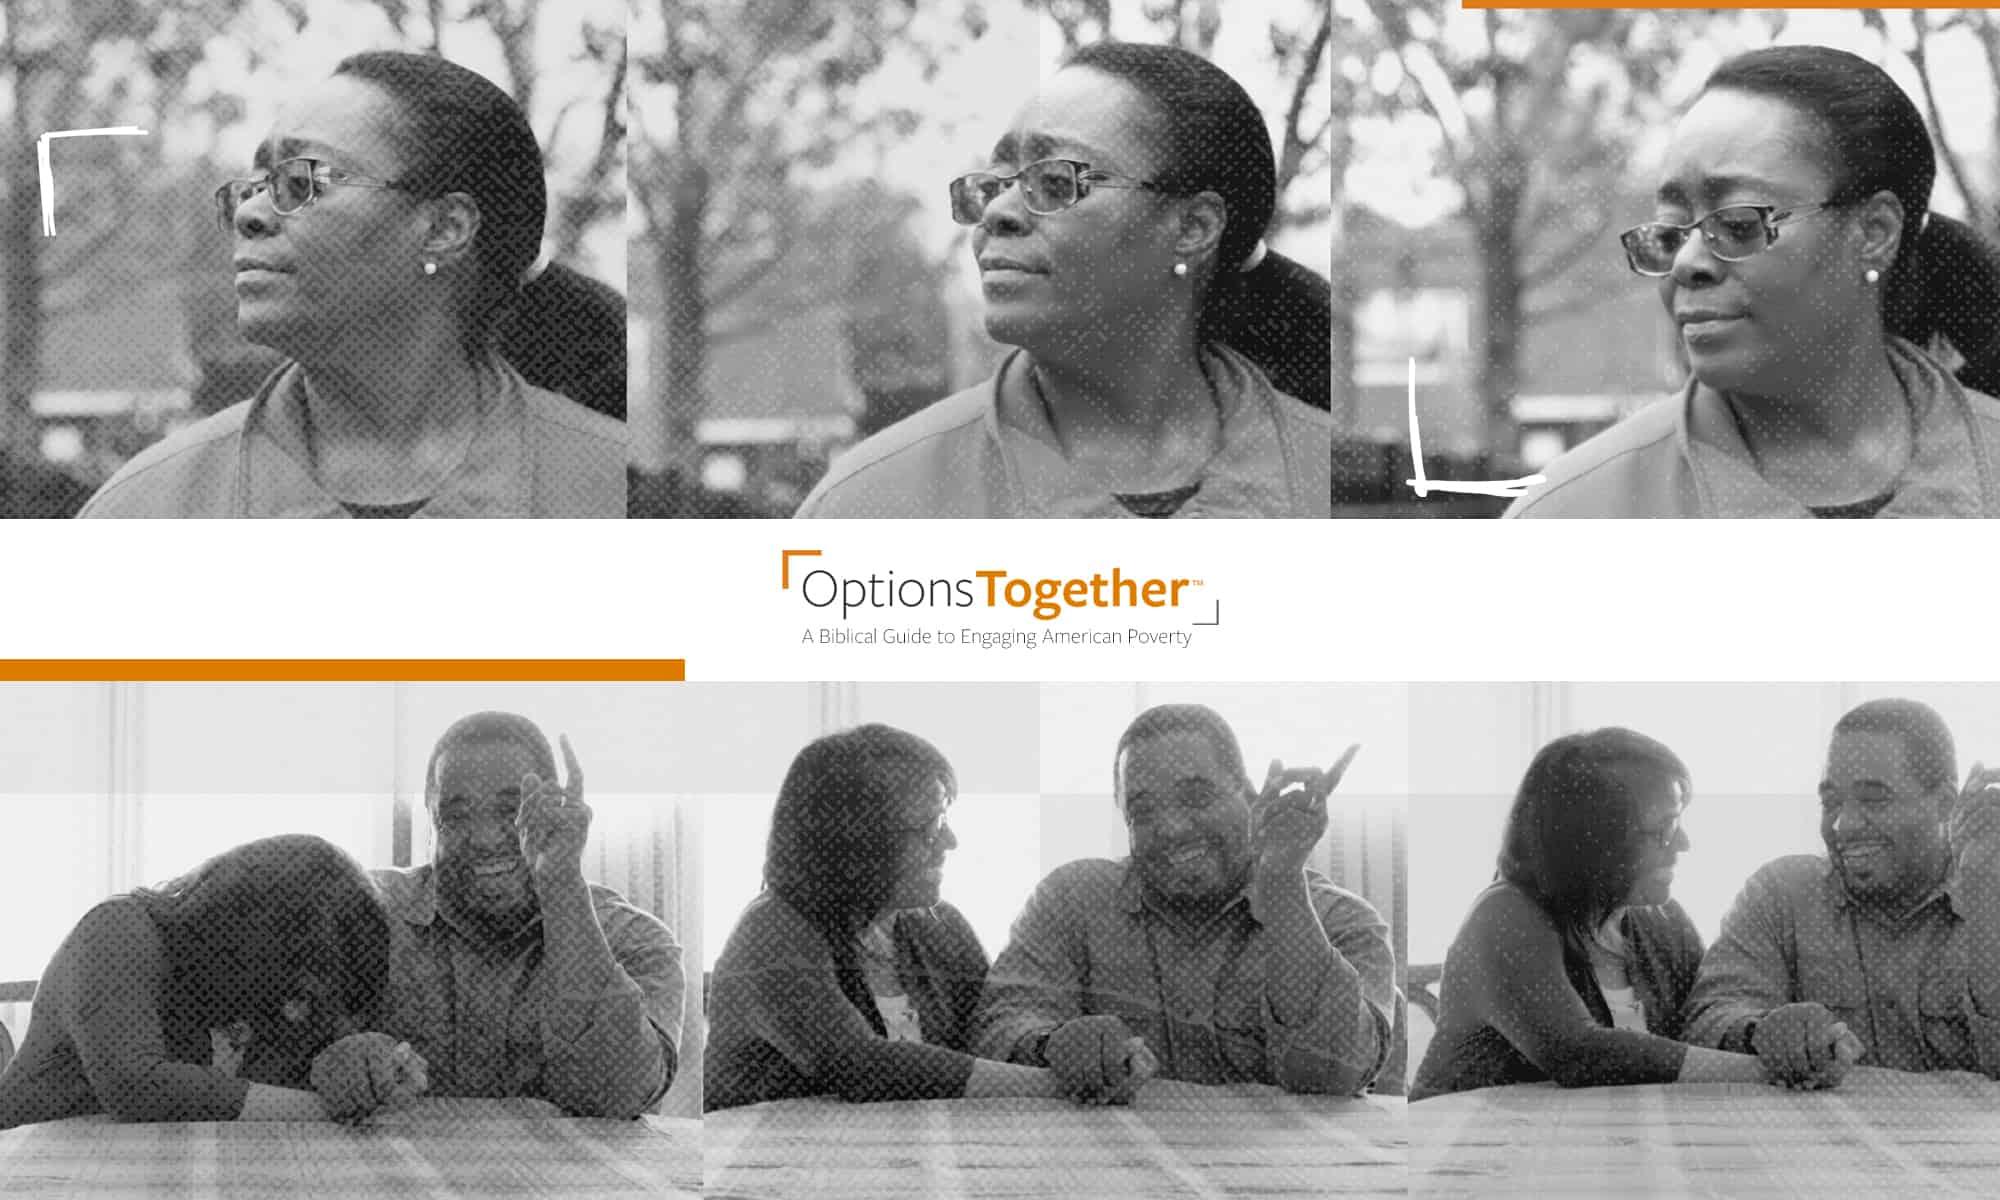 Options Together™